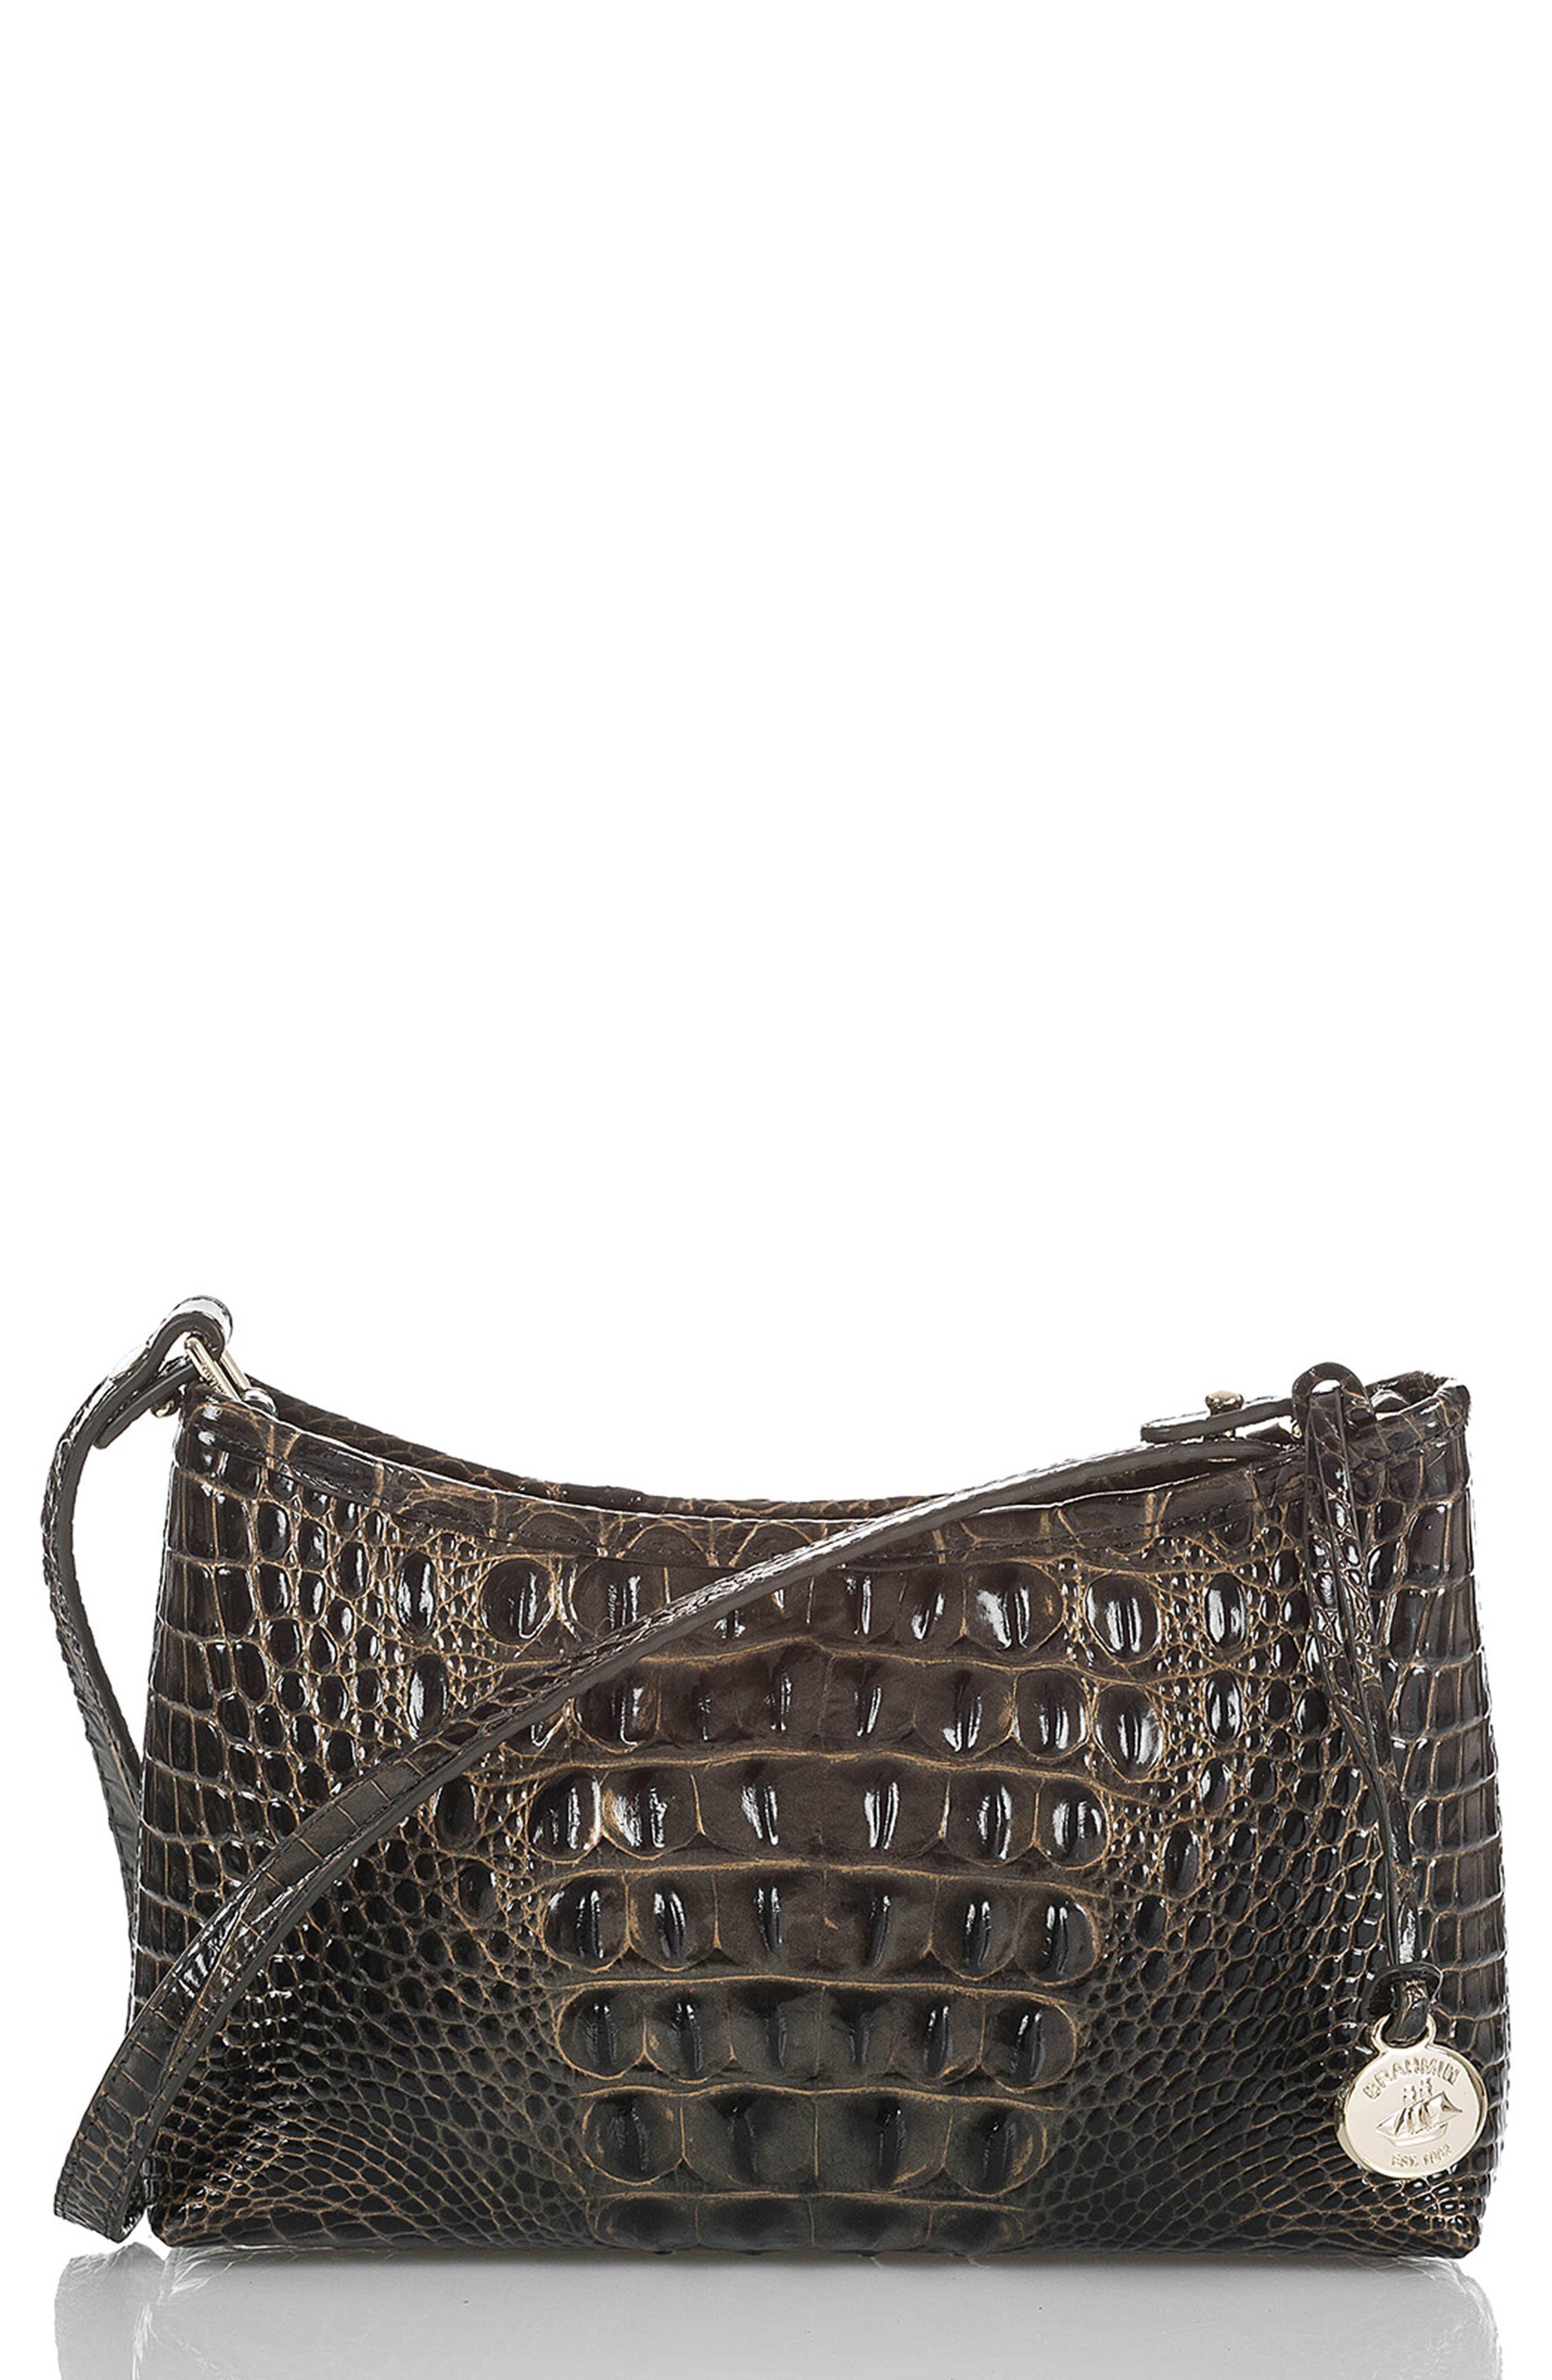 'Anytime - Mini' Convertible Handbag,                             Main thumbnail 1, color,                             GRAPHITE